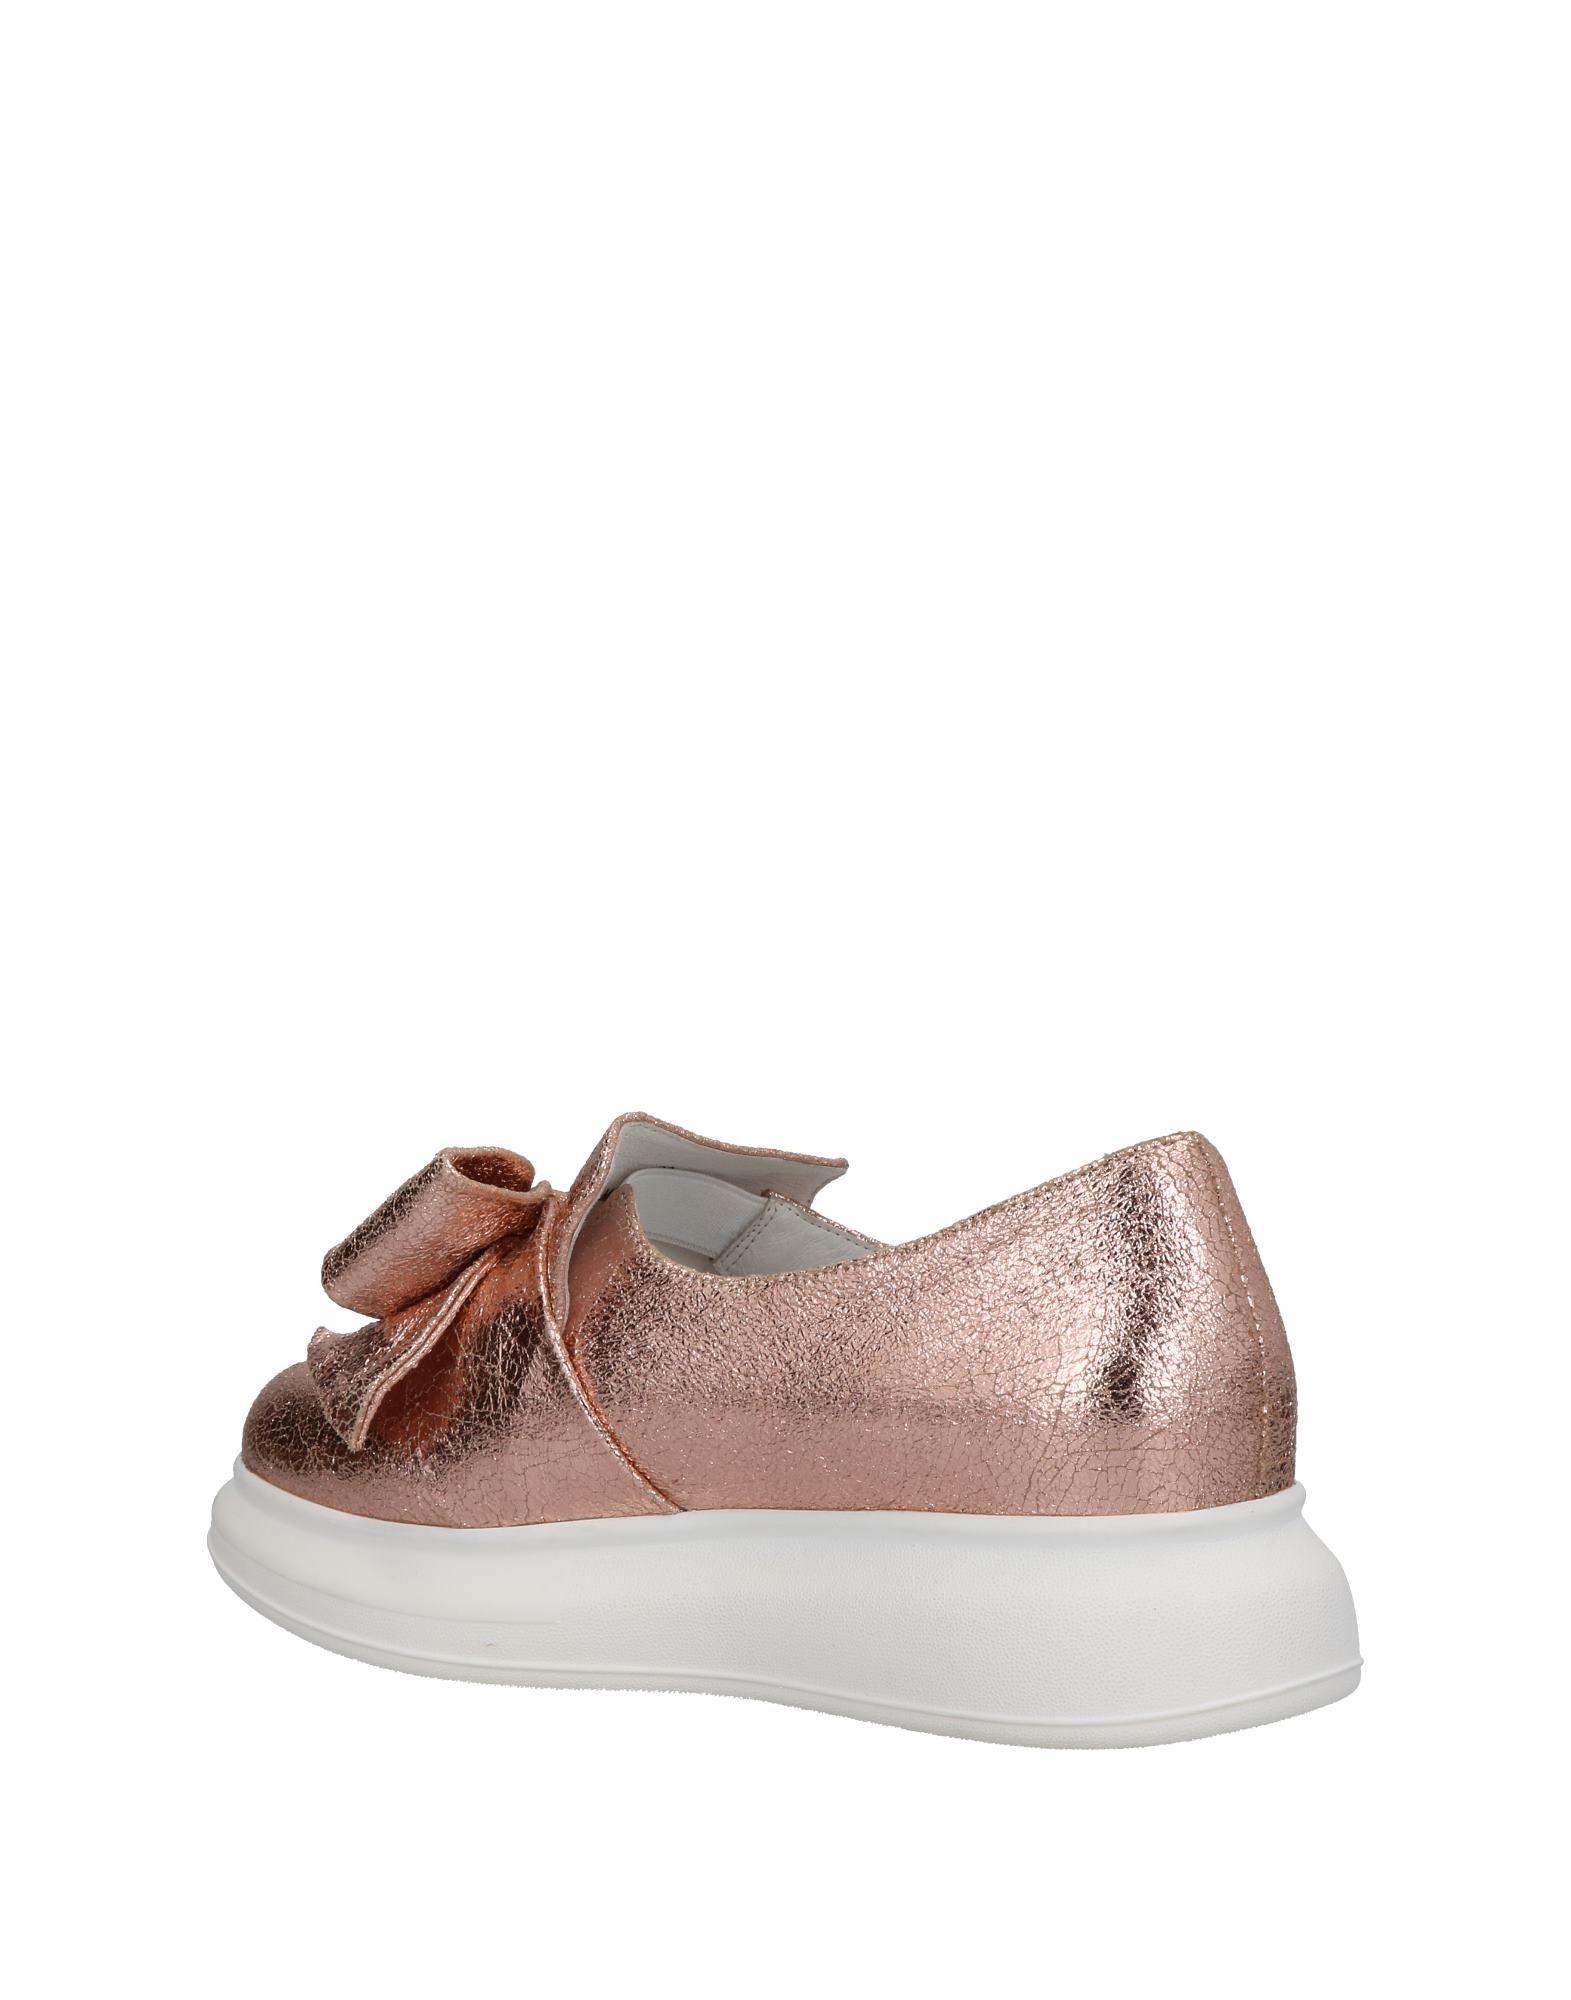 Sneakers Jeffrey Campbell Femme - Sneakers Jeffrey Campbell sur